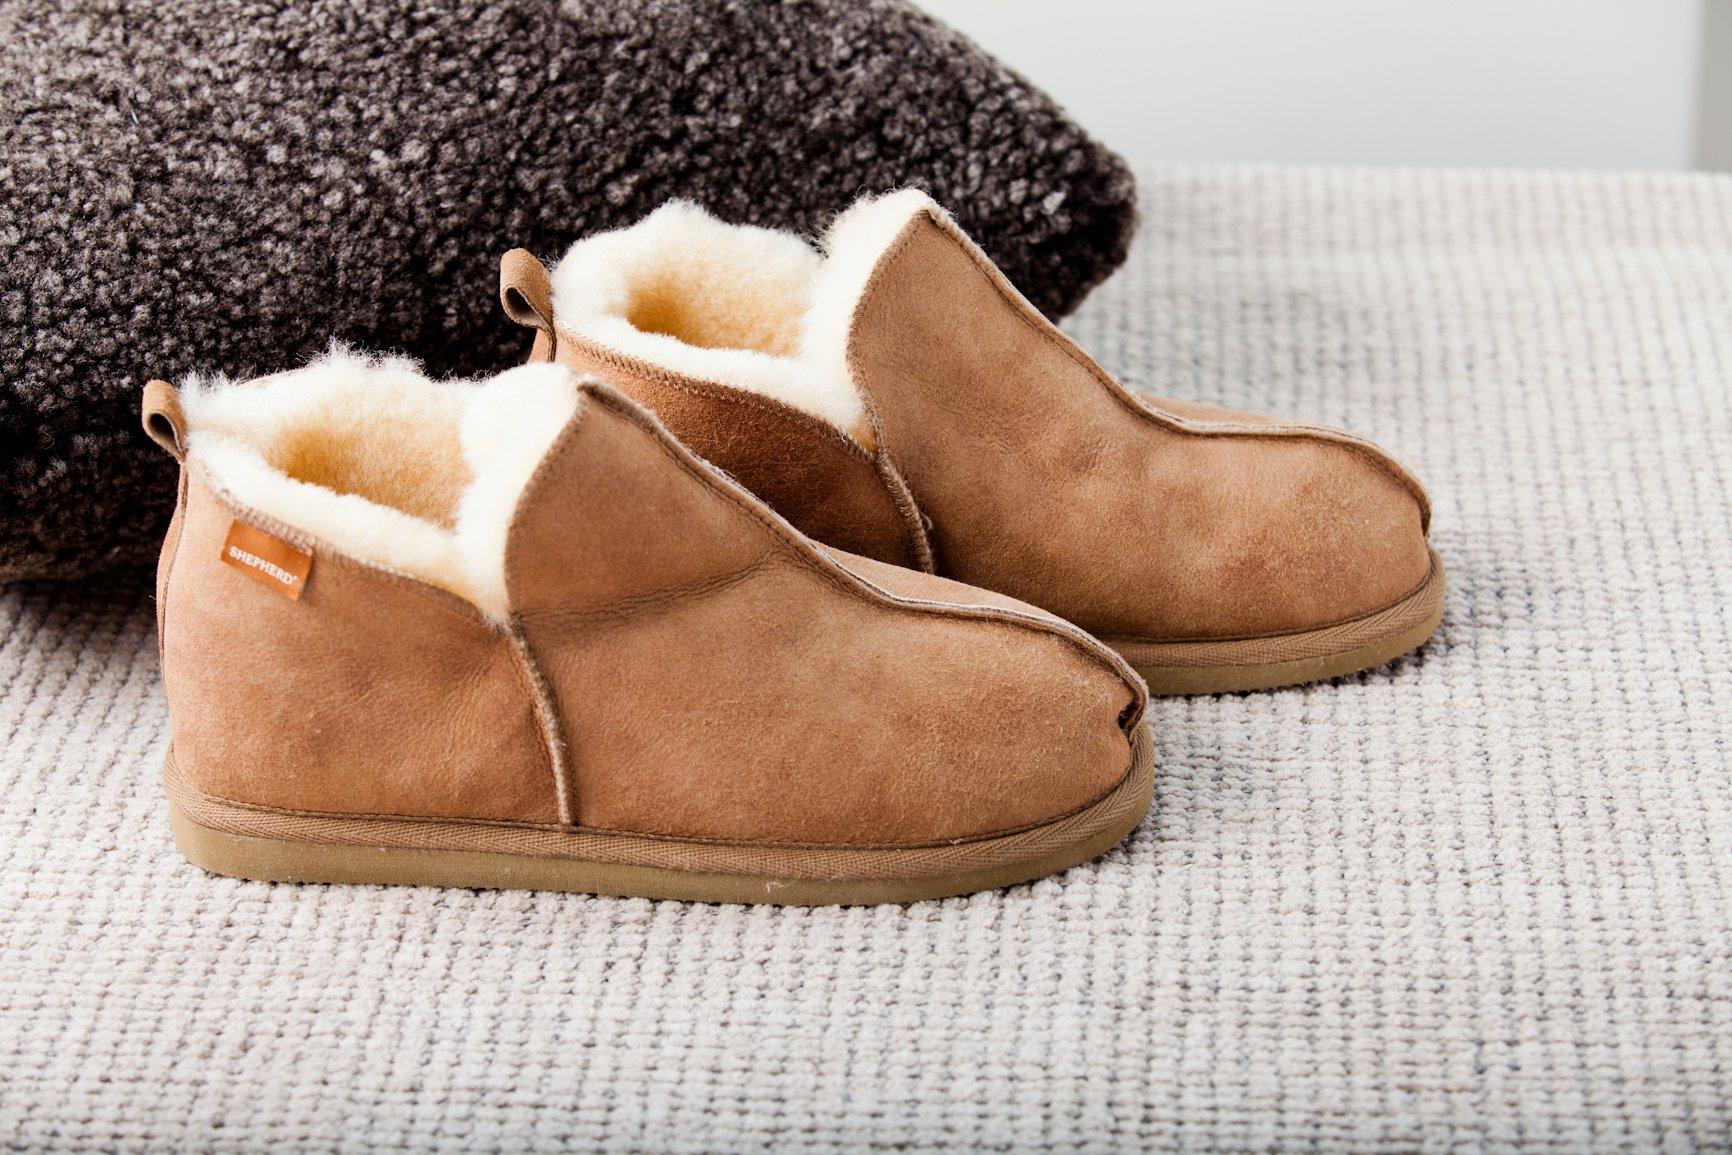 Fashion tips for women's – Try sheepskin slippers